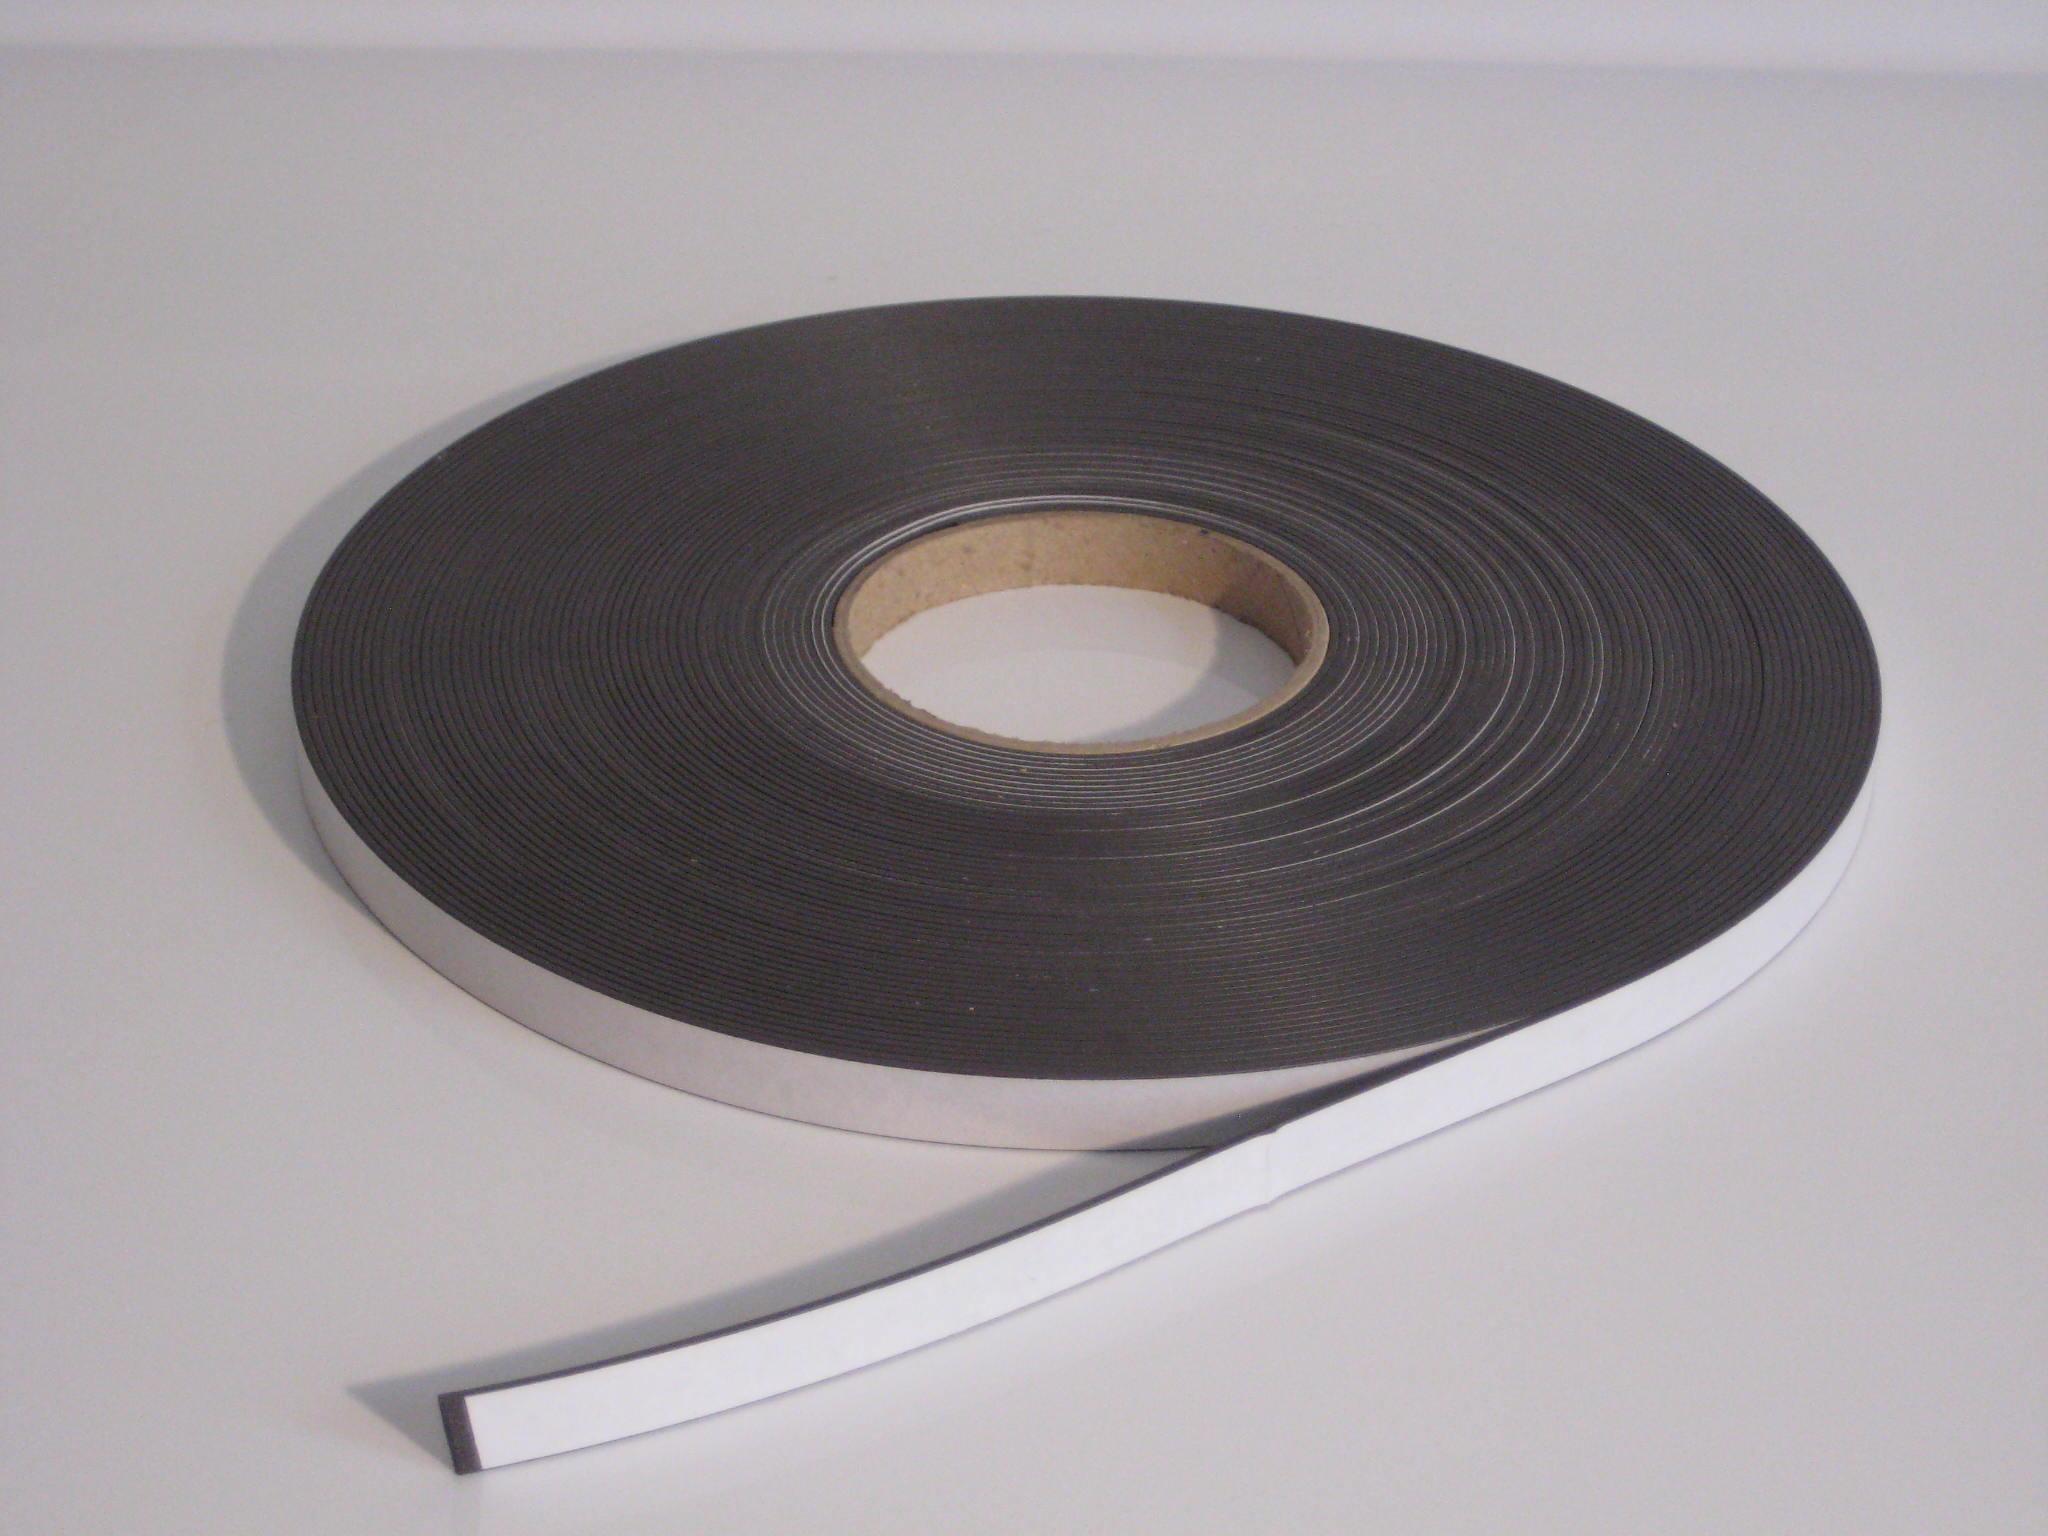 Foam Backed Self Adheasive Metal Strip